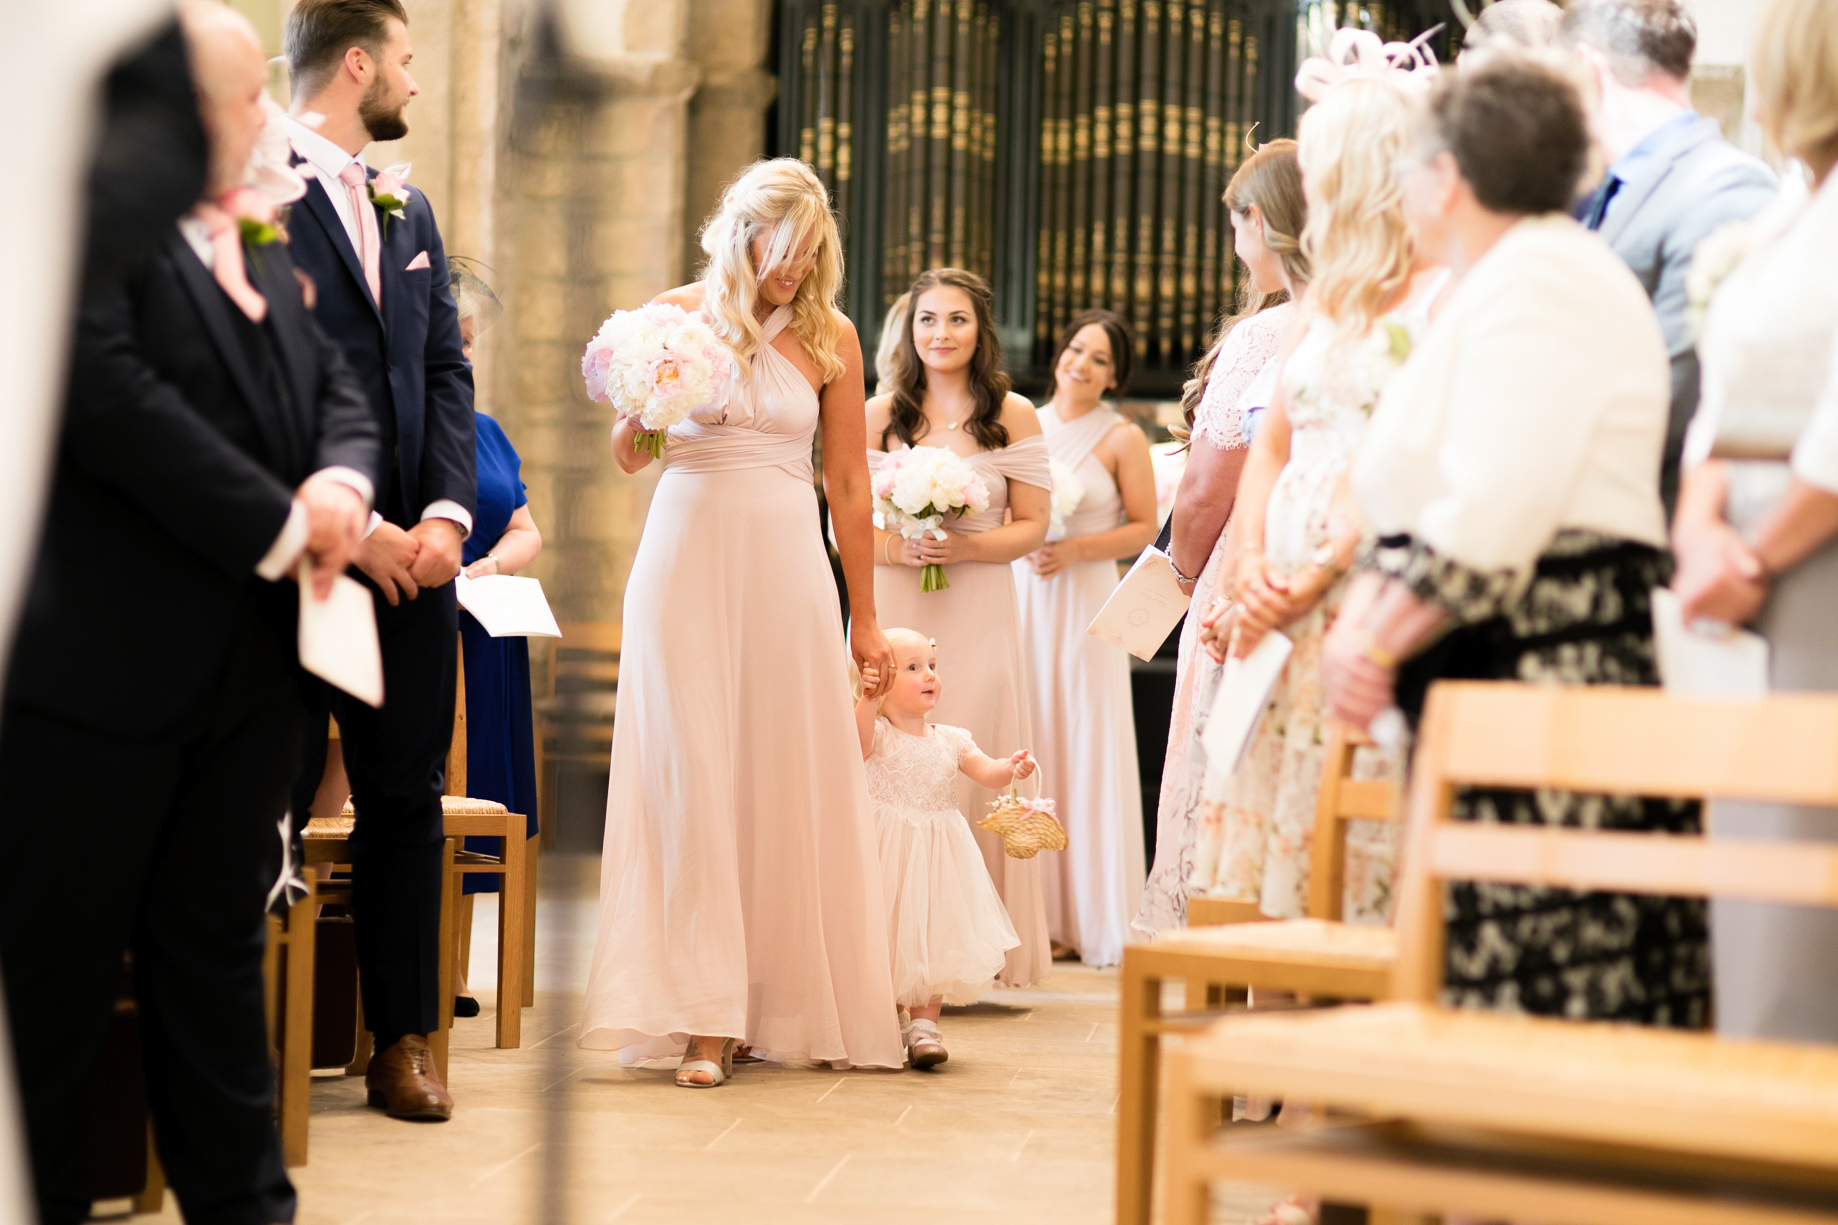 Headlam hall wedding photographer-24.jpg